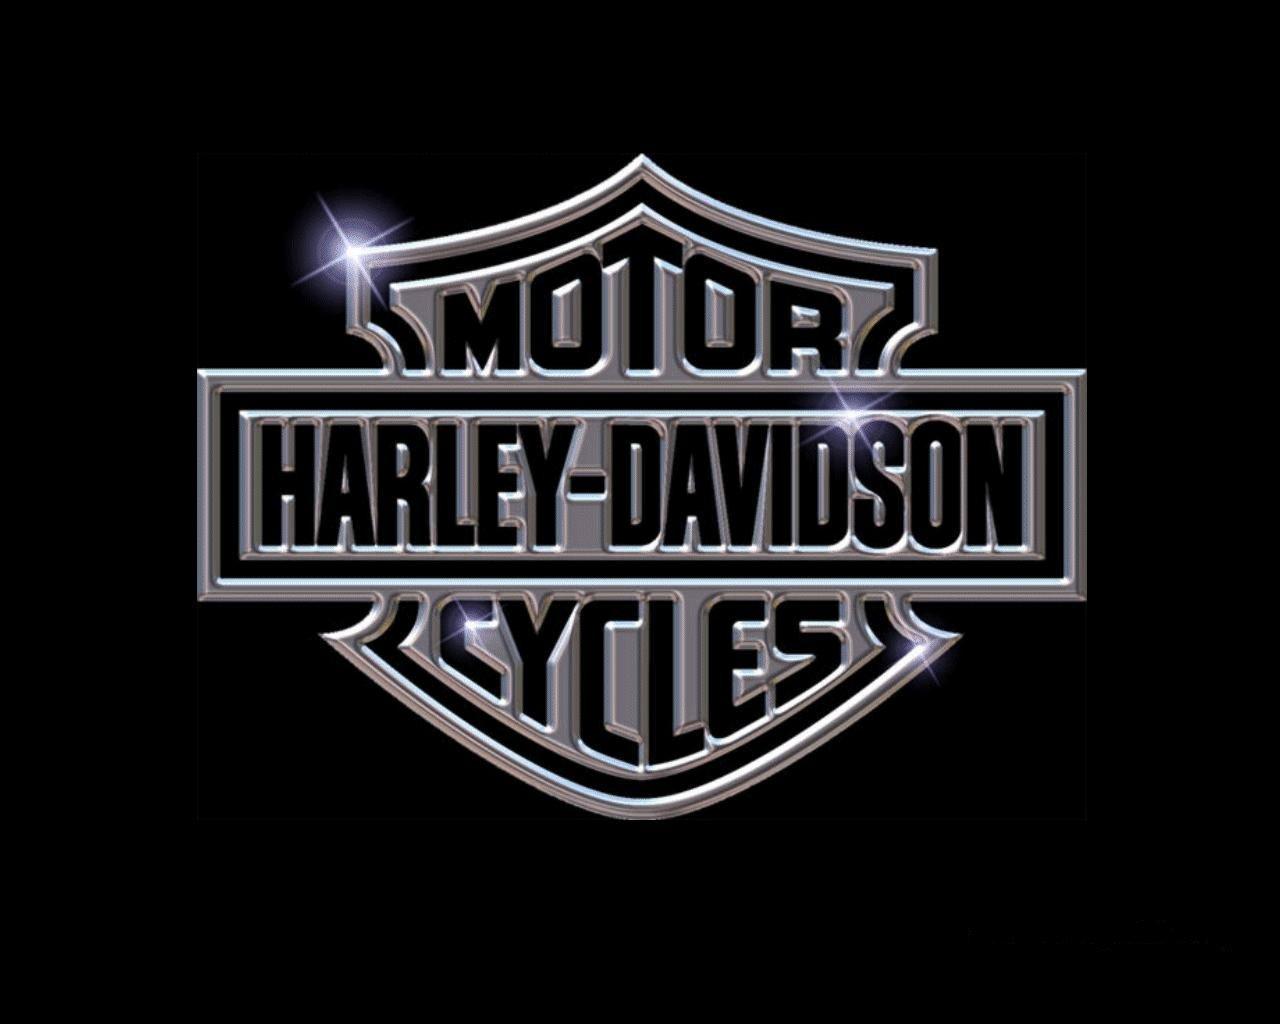 Harley Davidson Logo shine like a diamond 1280x1024